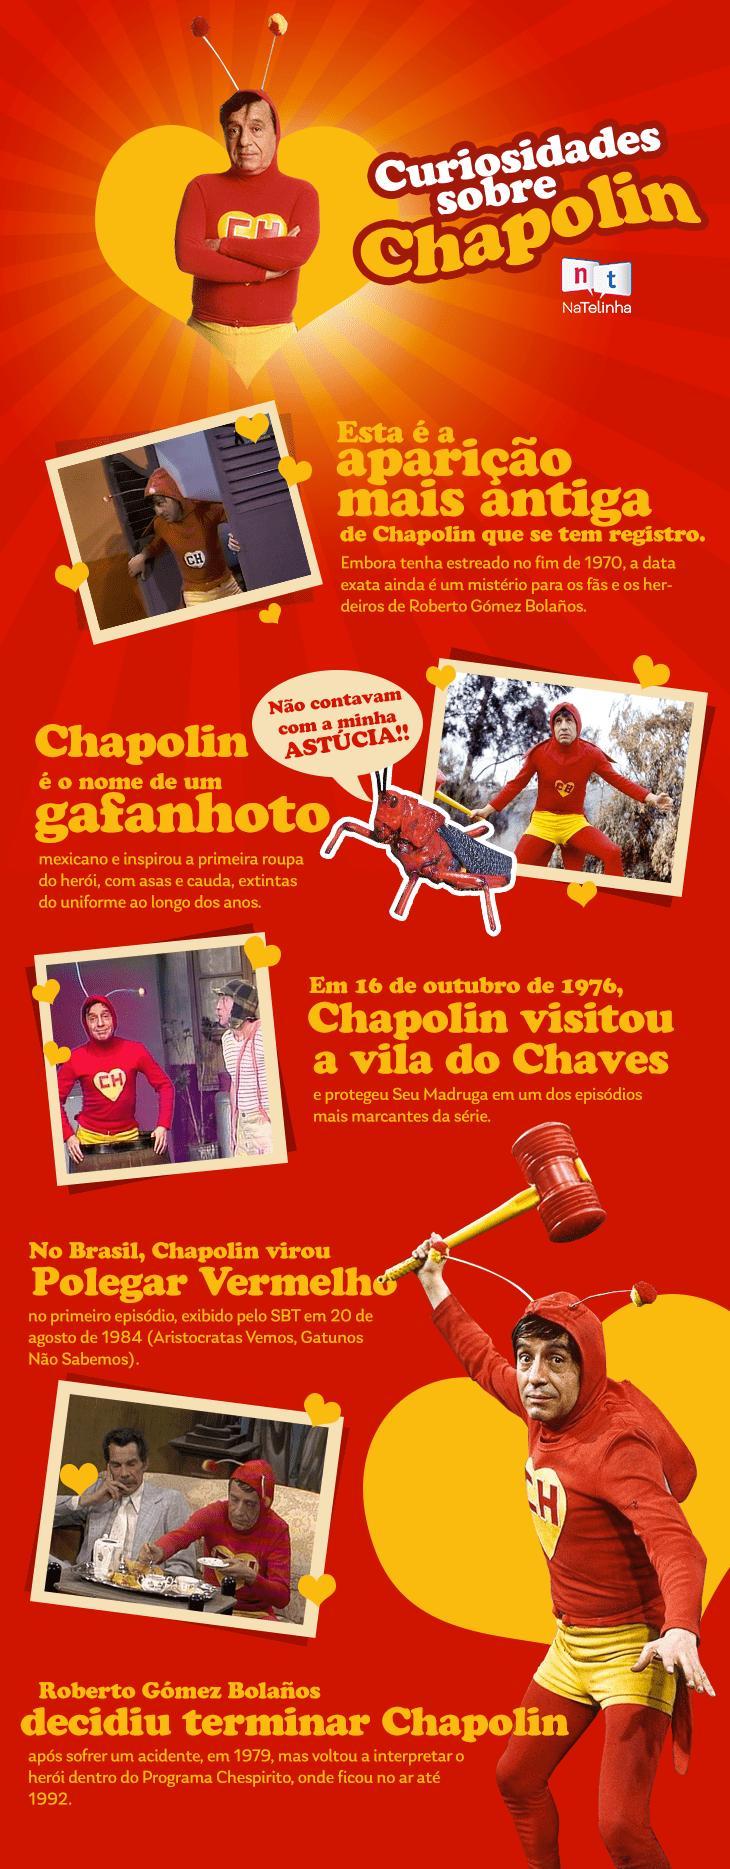 Fora da TV, Chapolin completa 50 anos